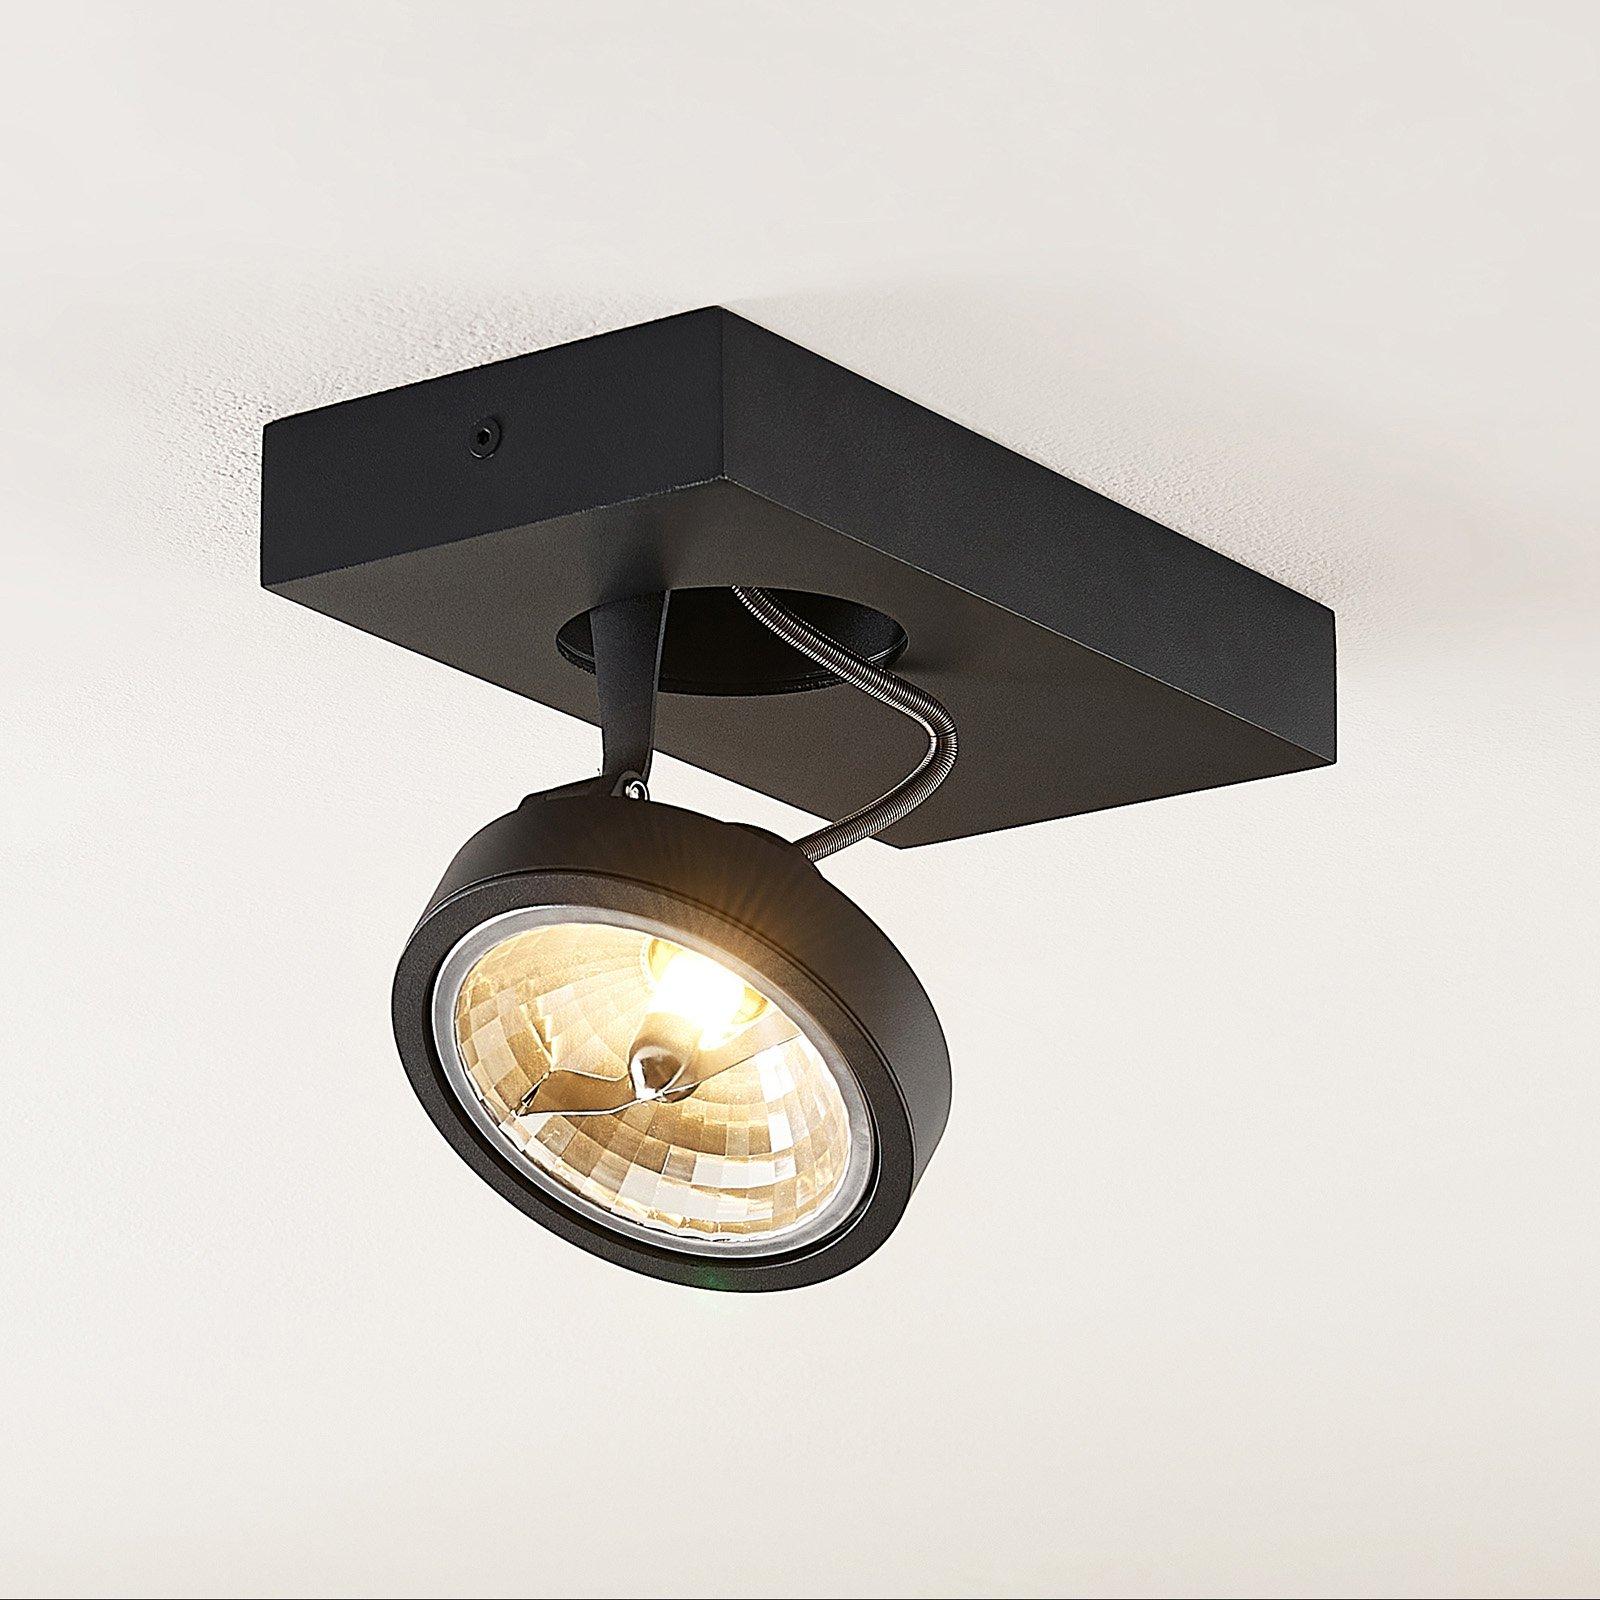 Arcchio Jorvin-takspot, 1 lyskilde, svart